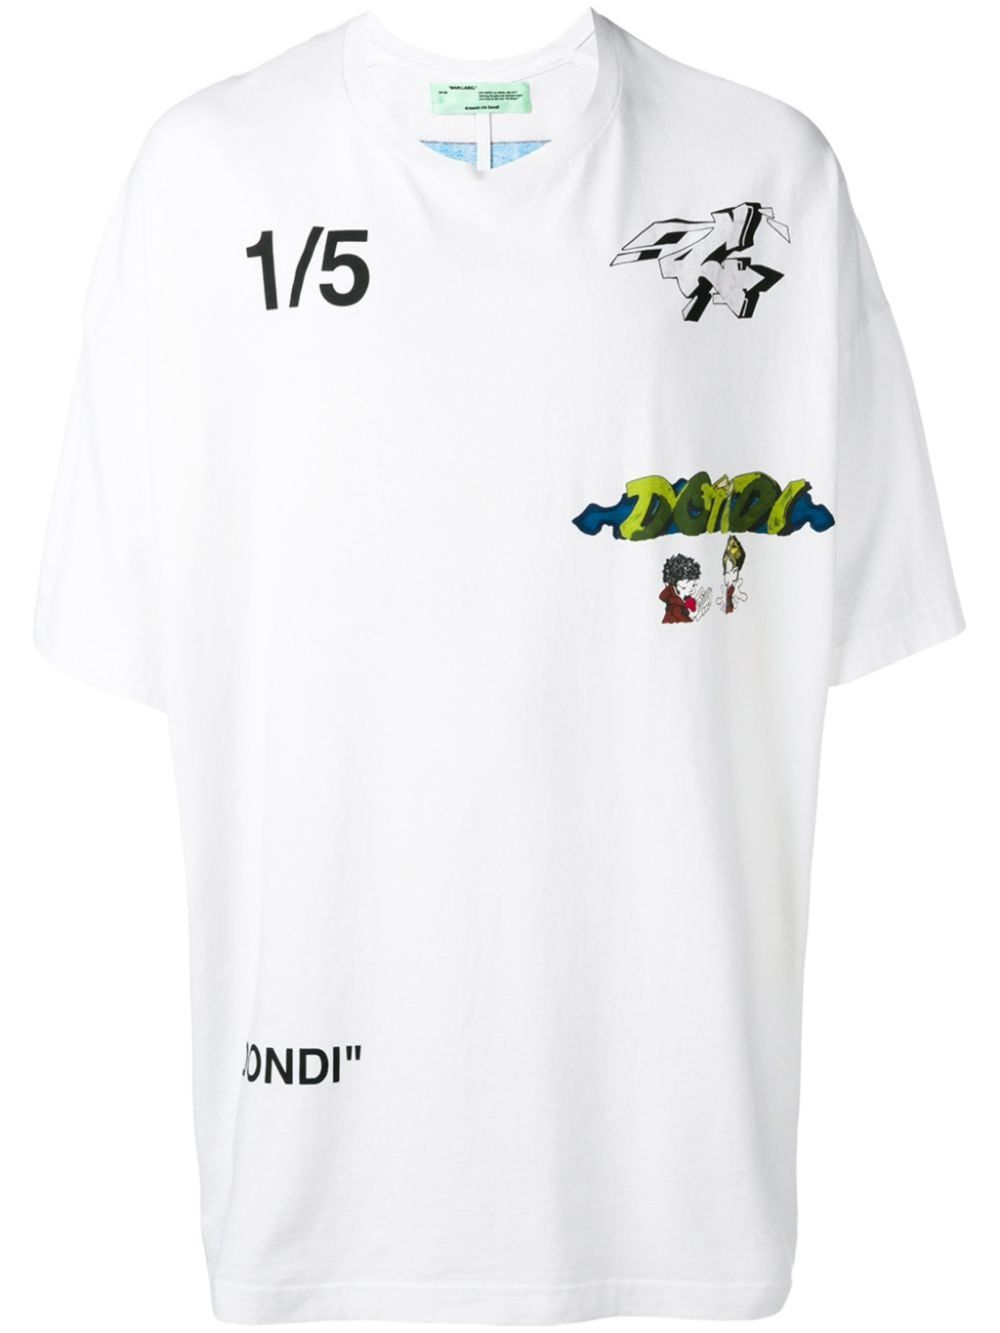 Off White T Shirt Mit Dondi Print Weiss T Shirt Tee Shirts